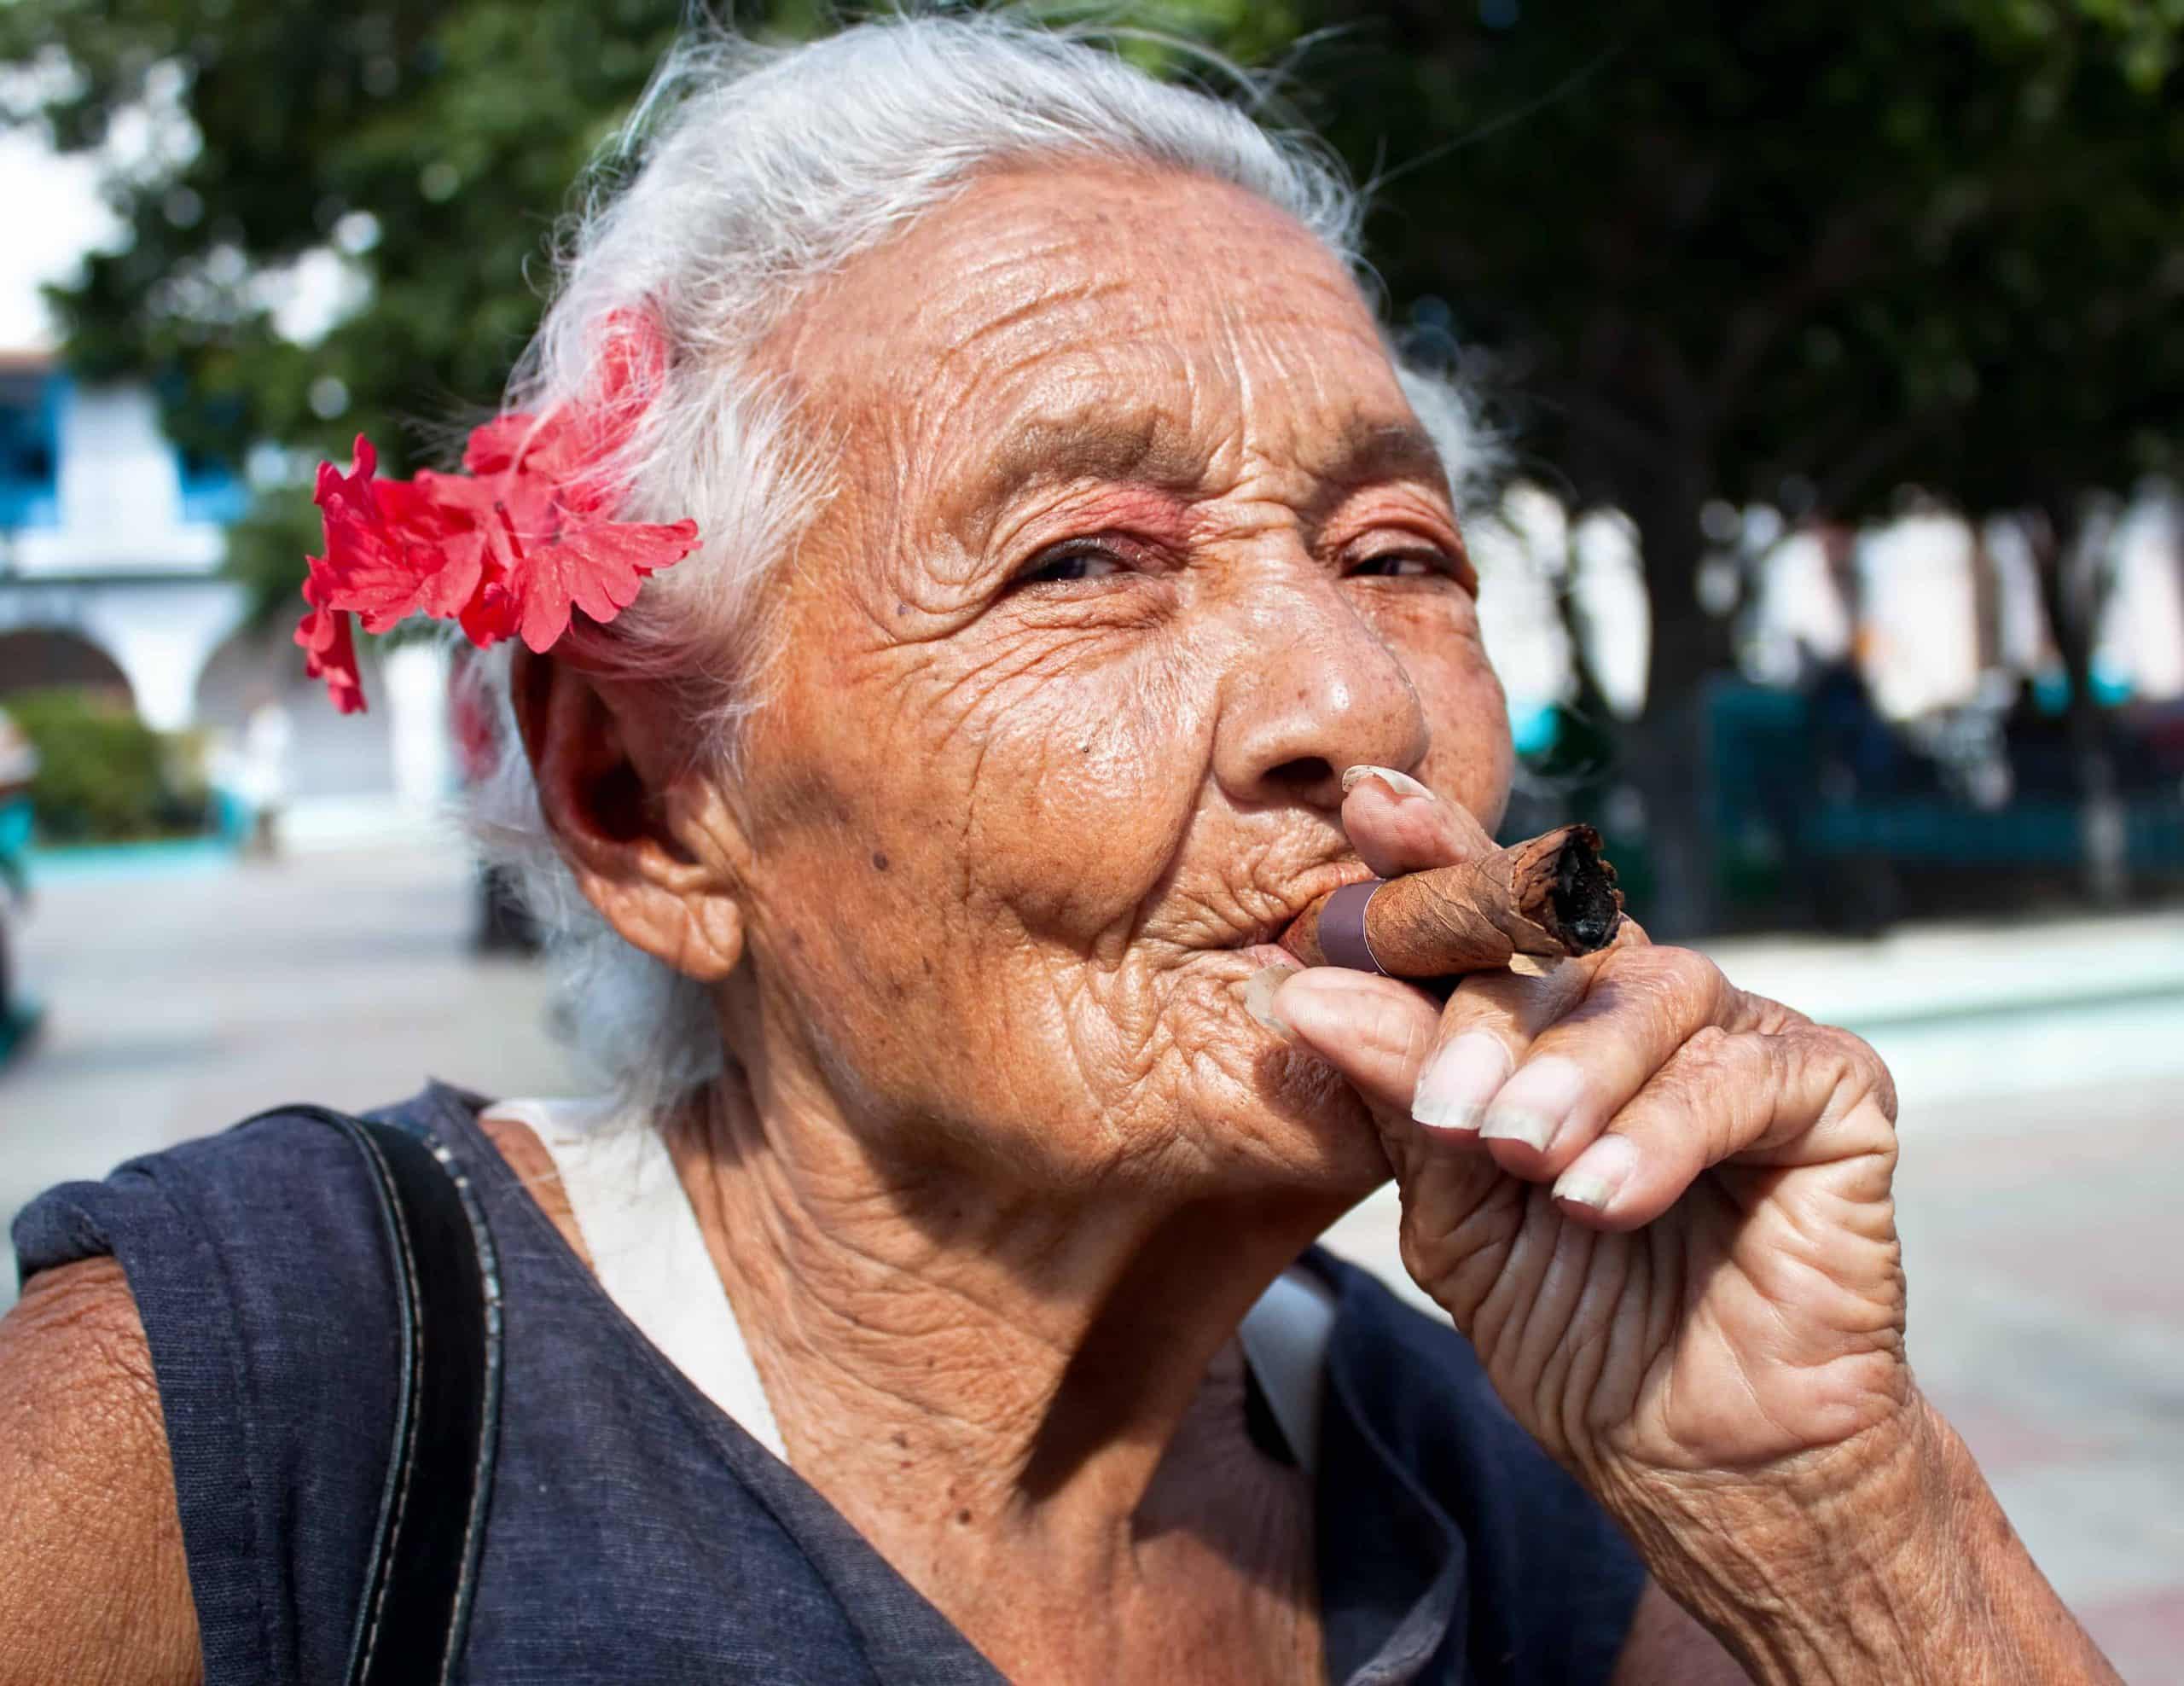 Cubansk kvinde med cigar